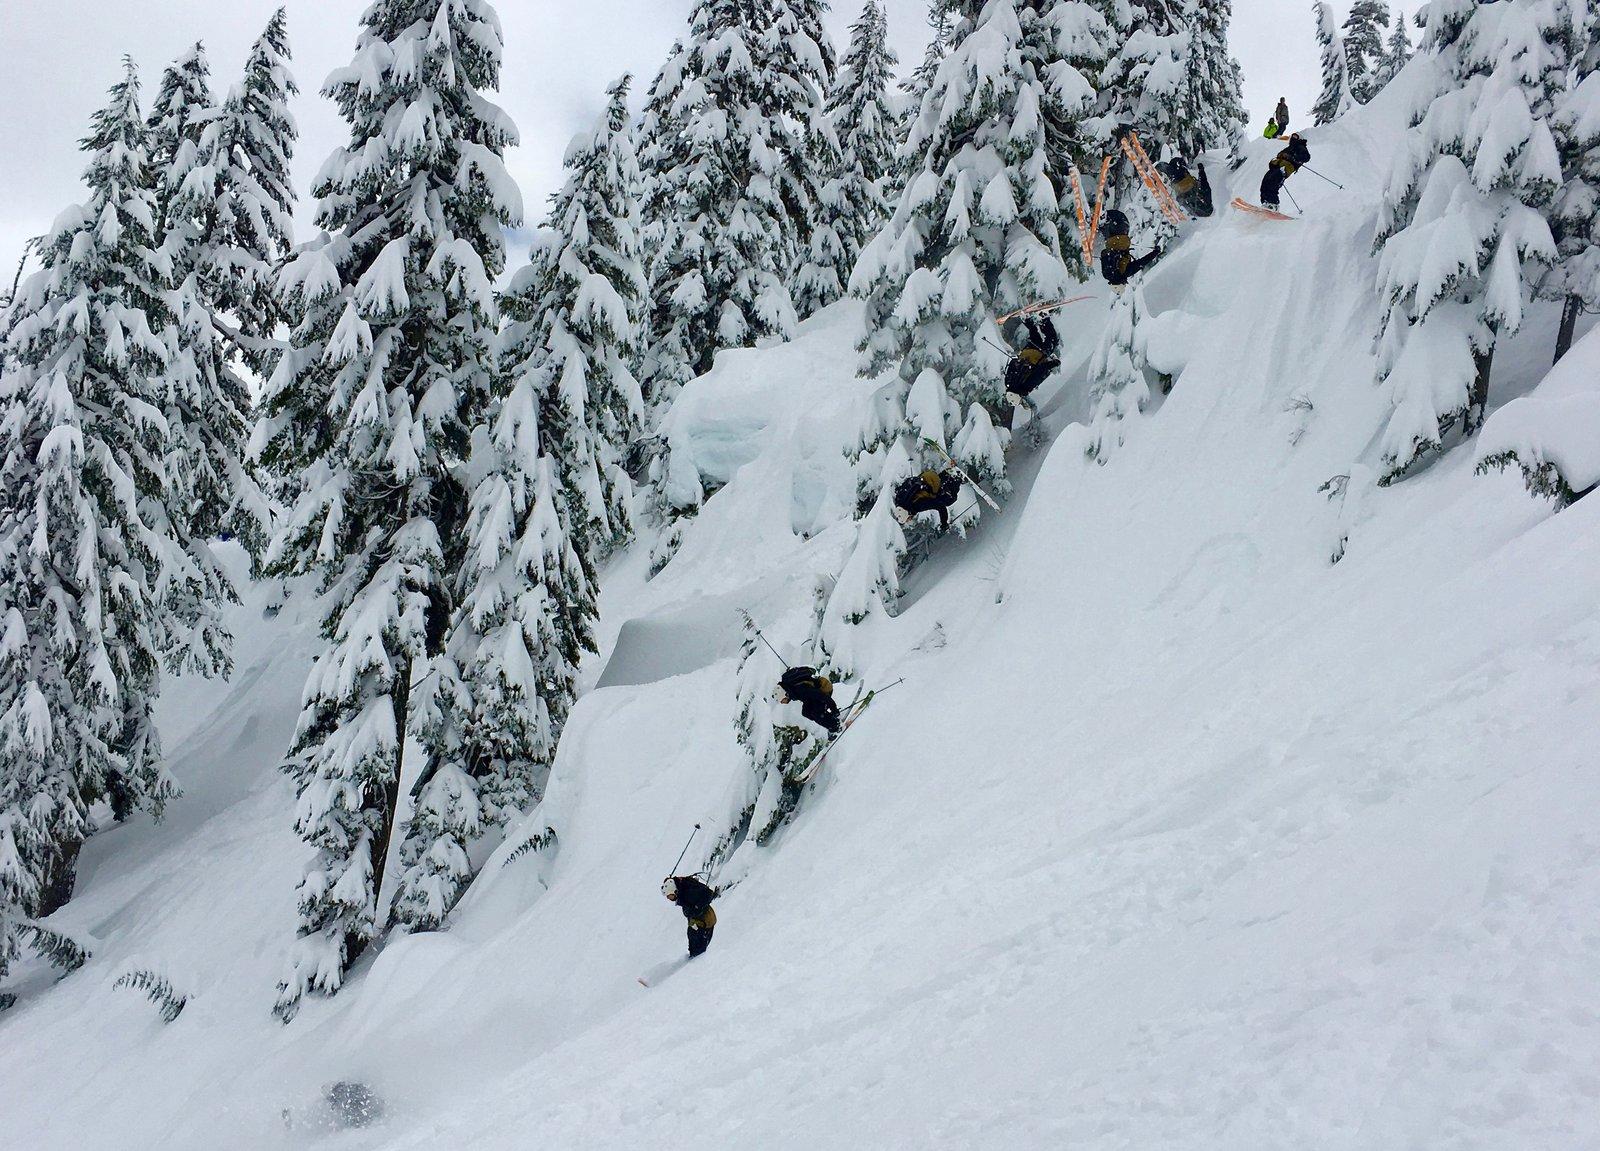 Backie at Alpental